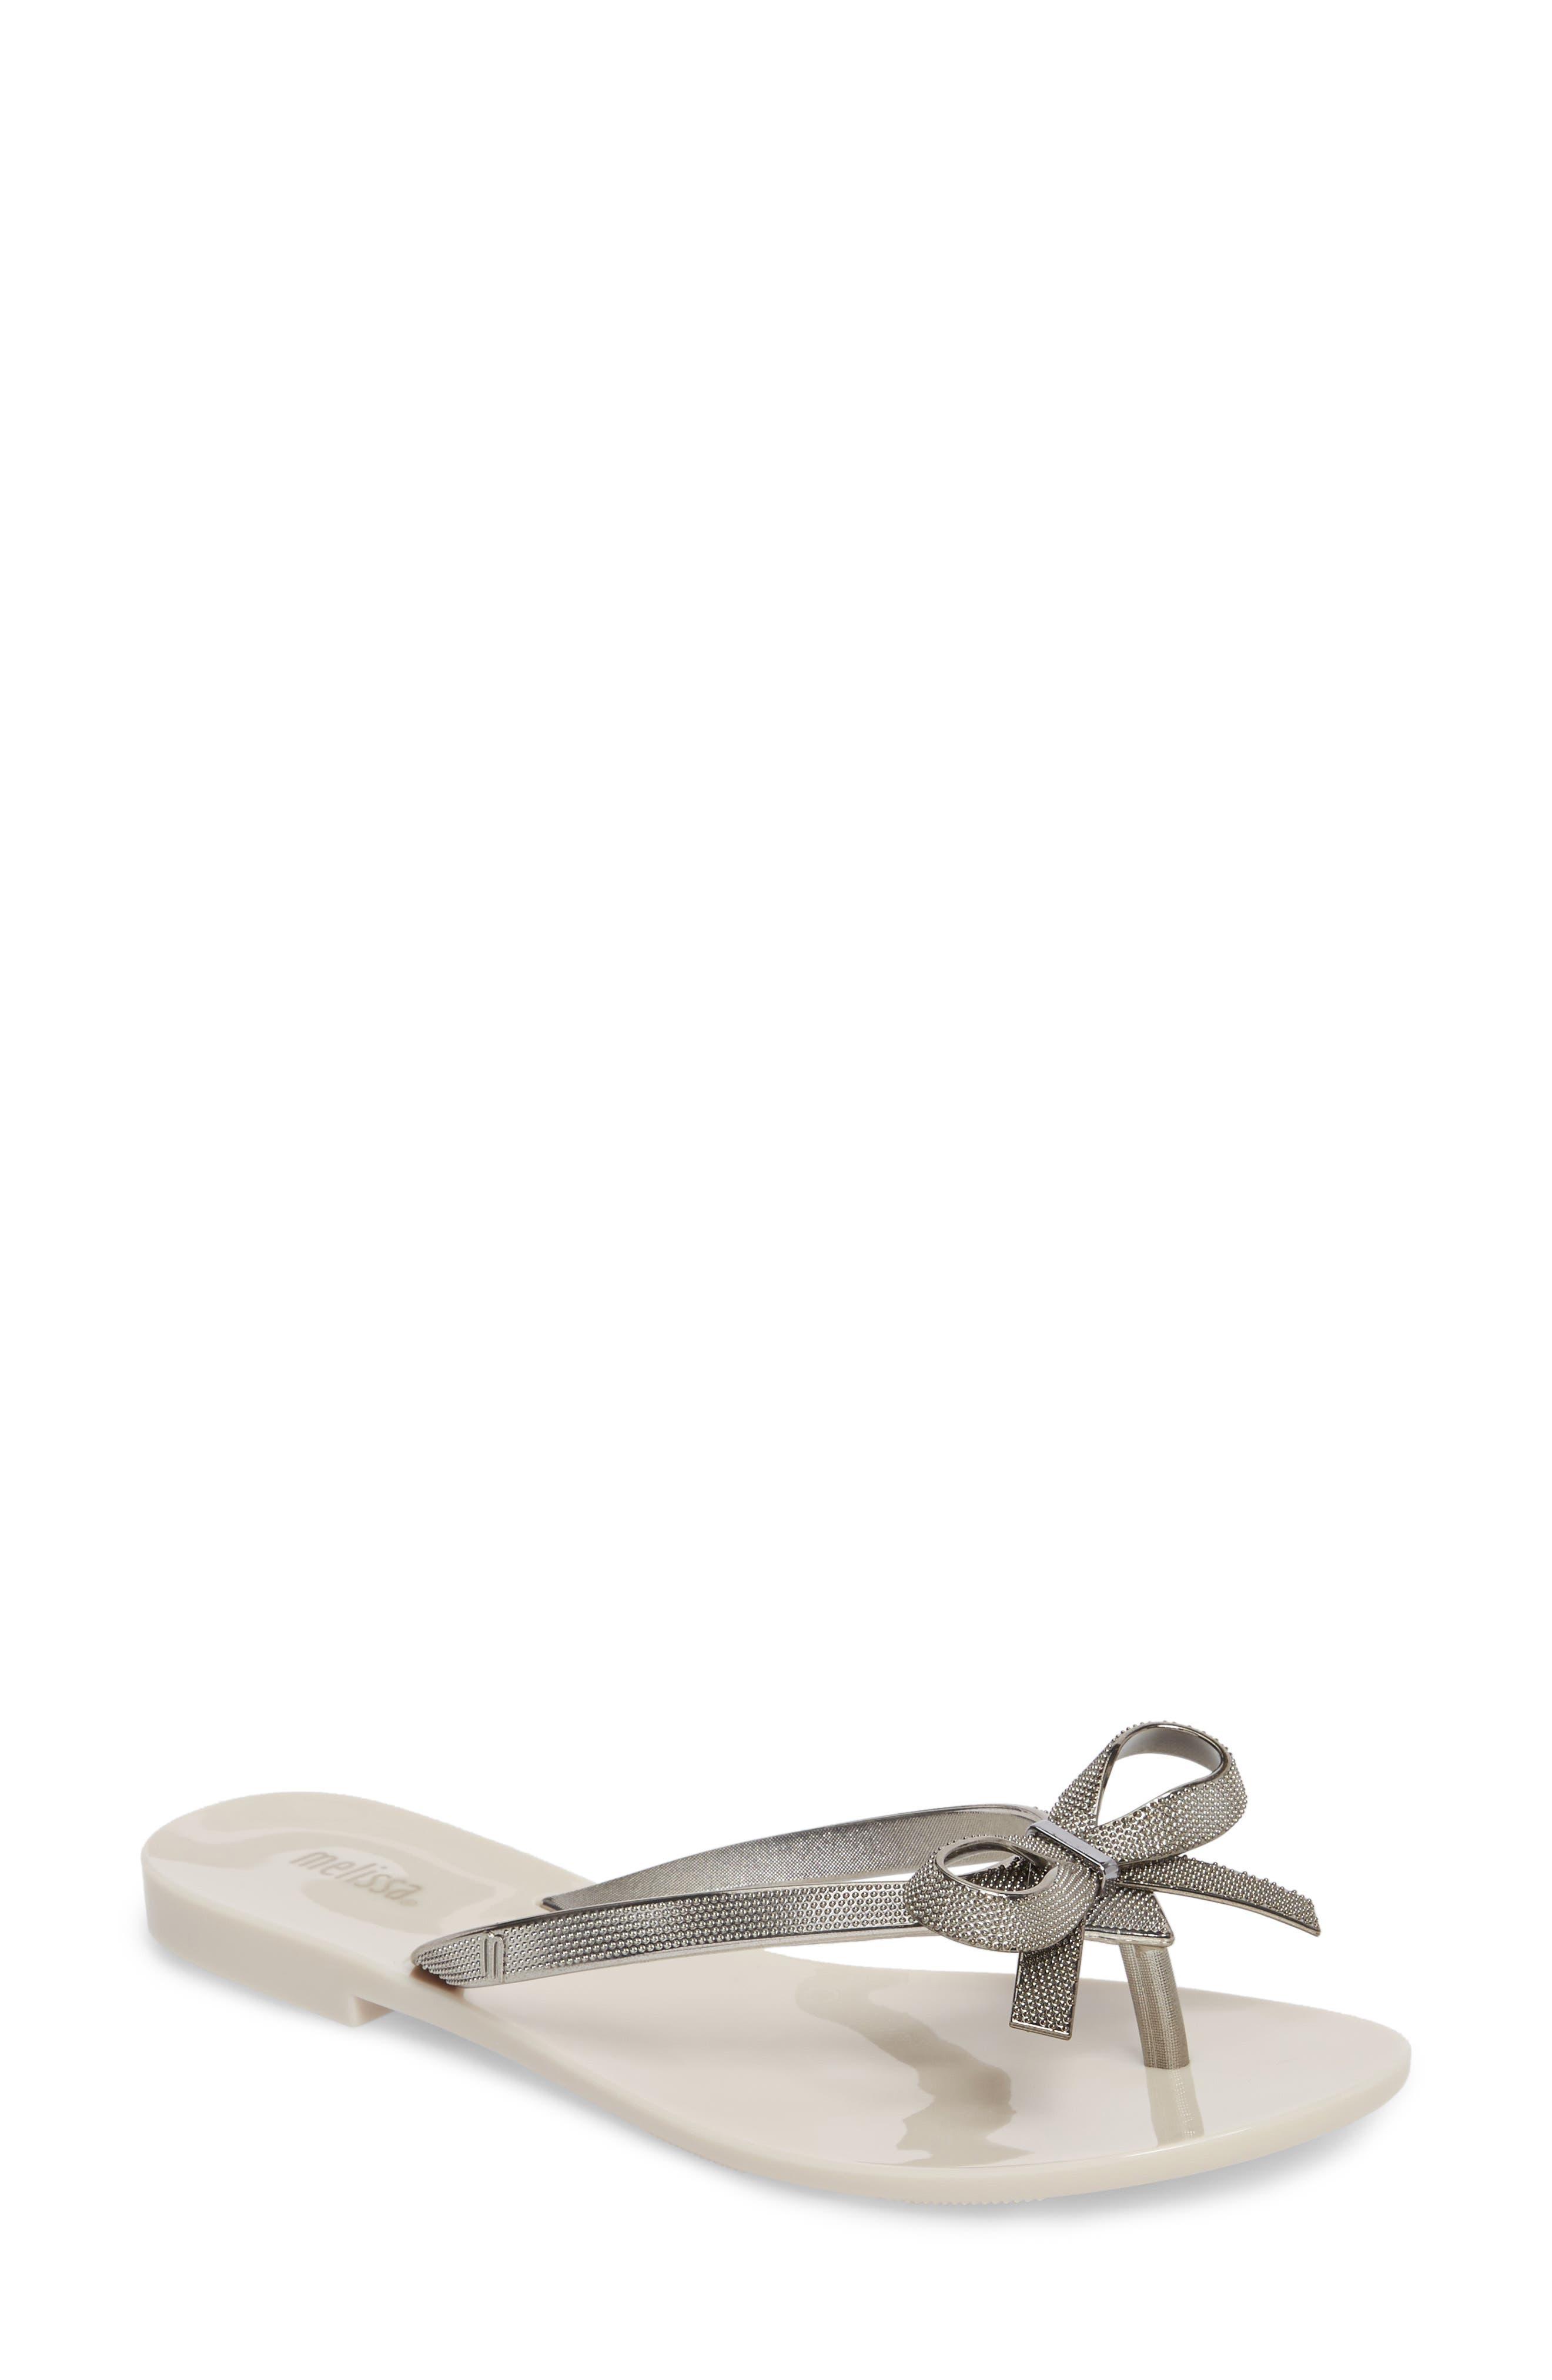 Harmonic Bow Chrome II Sandal,                         Main,                         color, 040